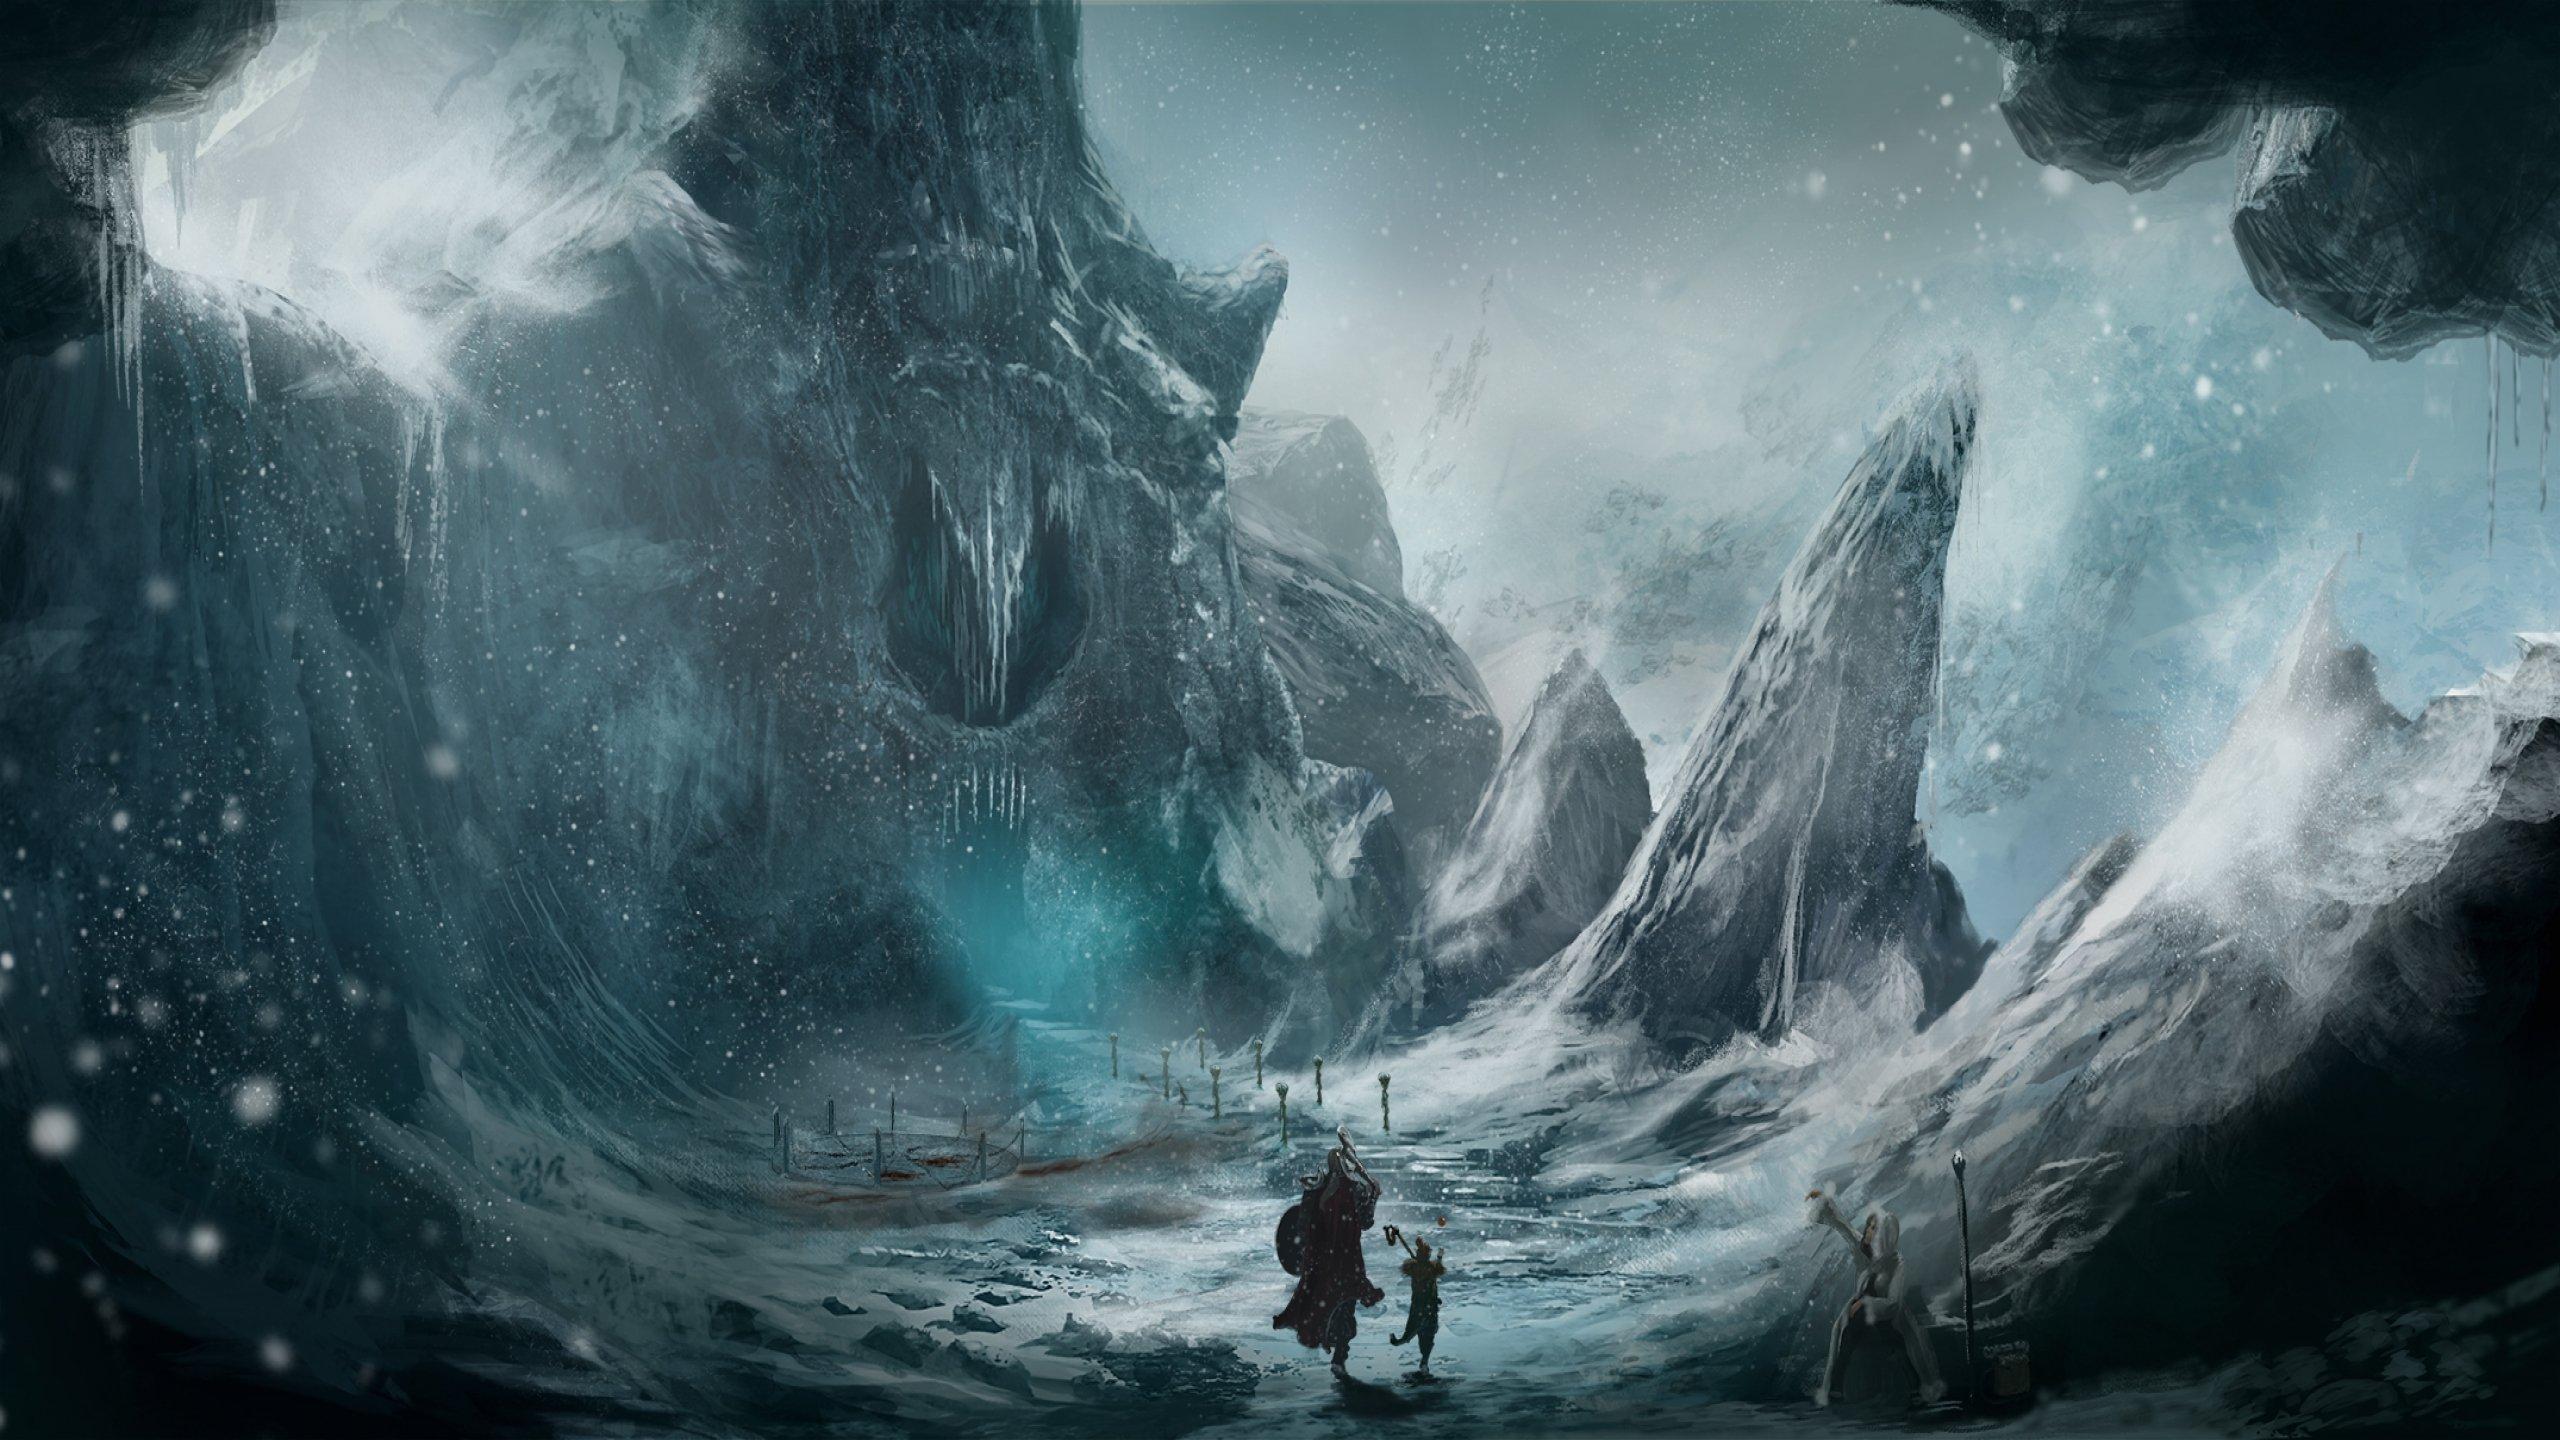 fantasy art artwork landscape nature adventure warrior